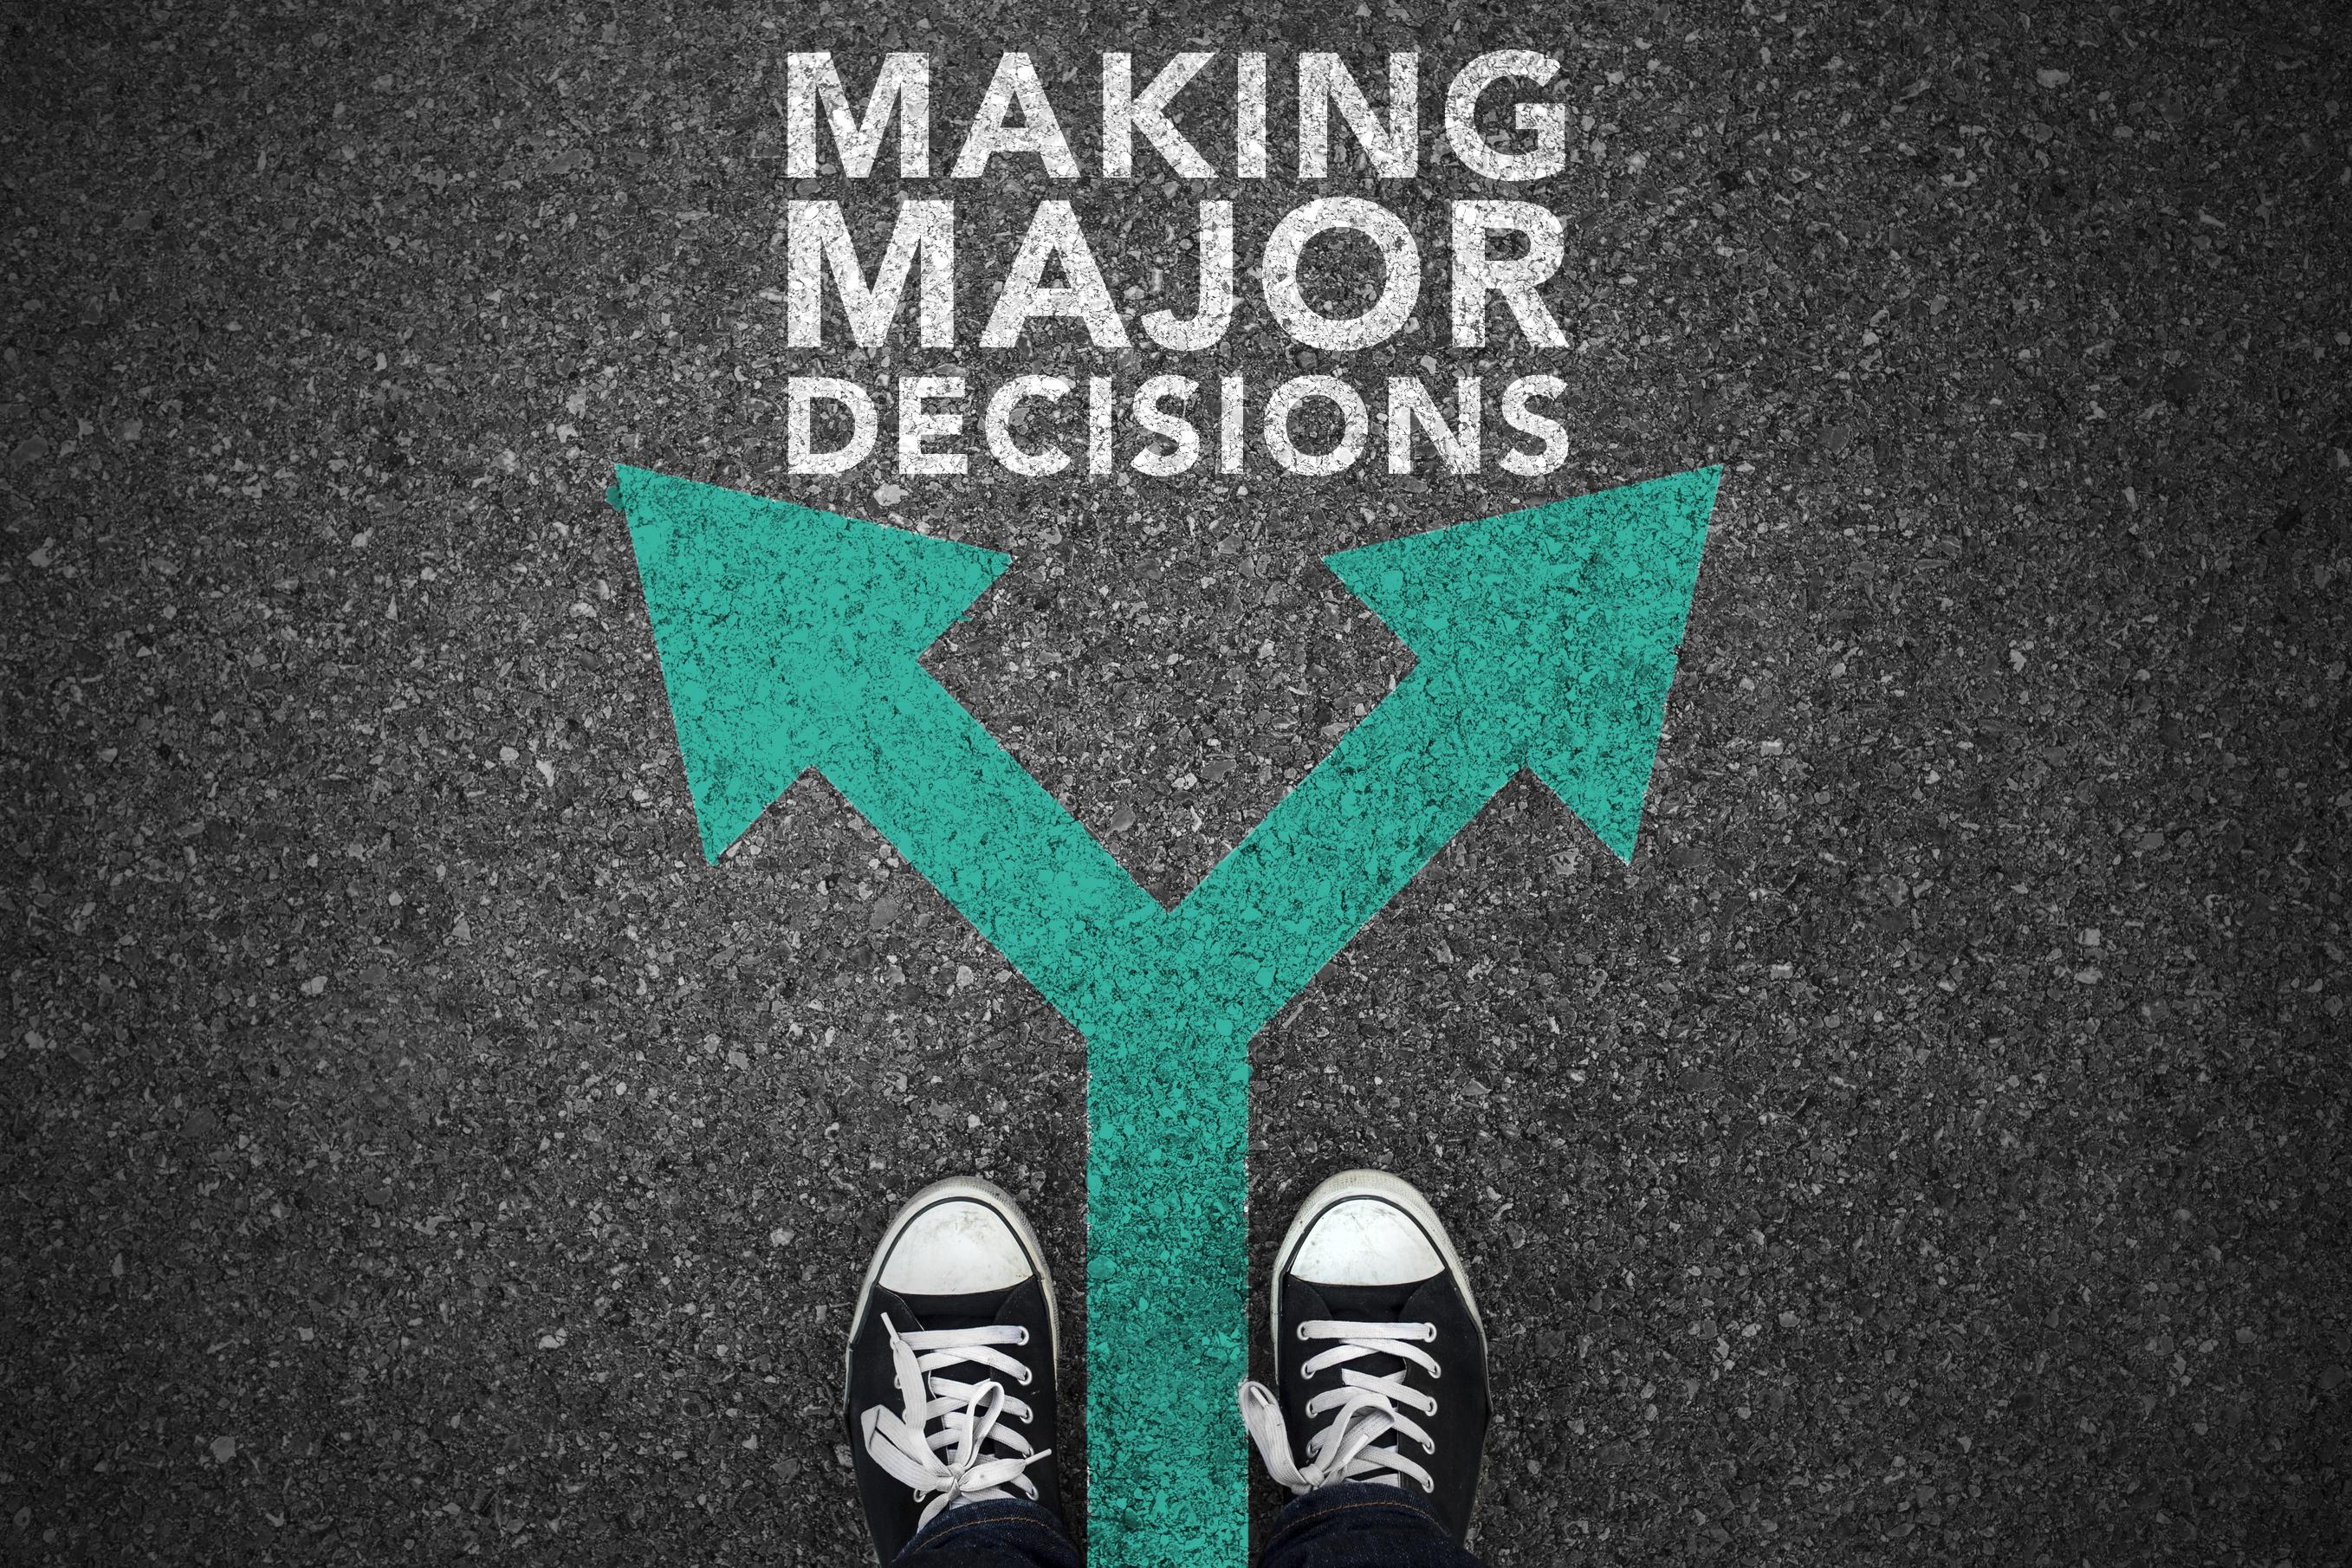 Making Major Decisions